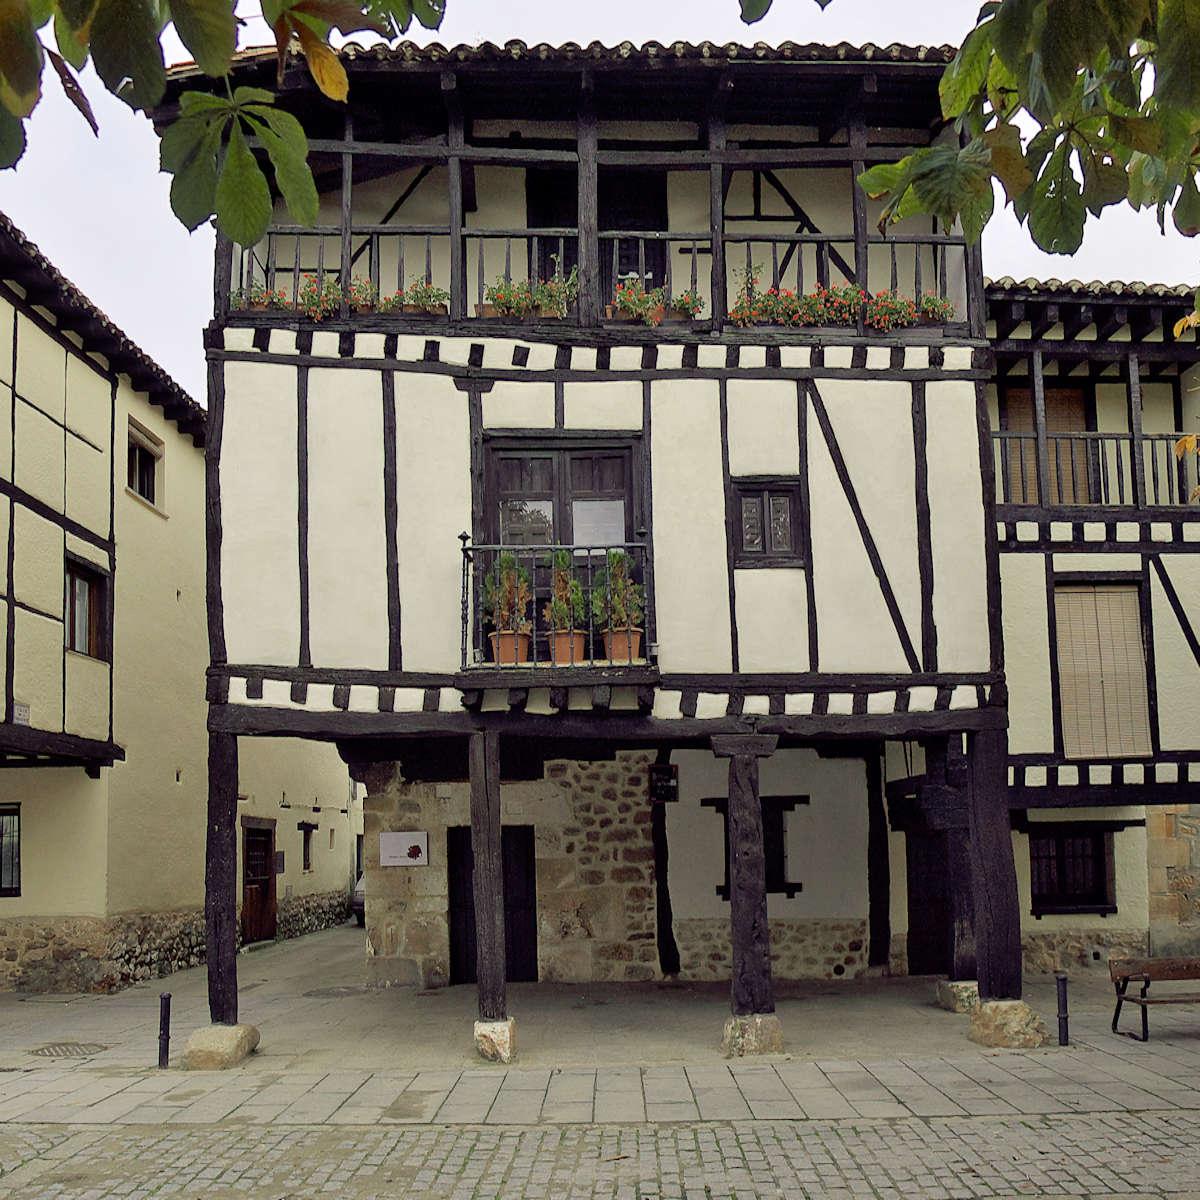 Casa-de-Doña-Sancha-de-Covarrubias-Burgos